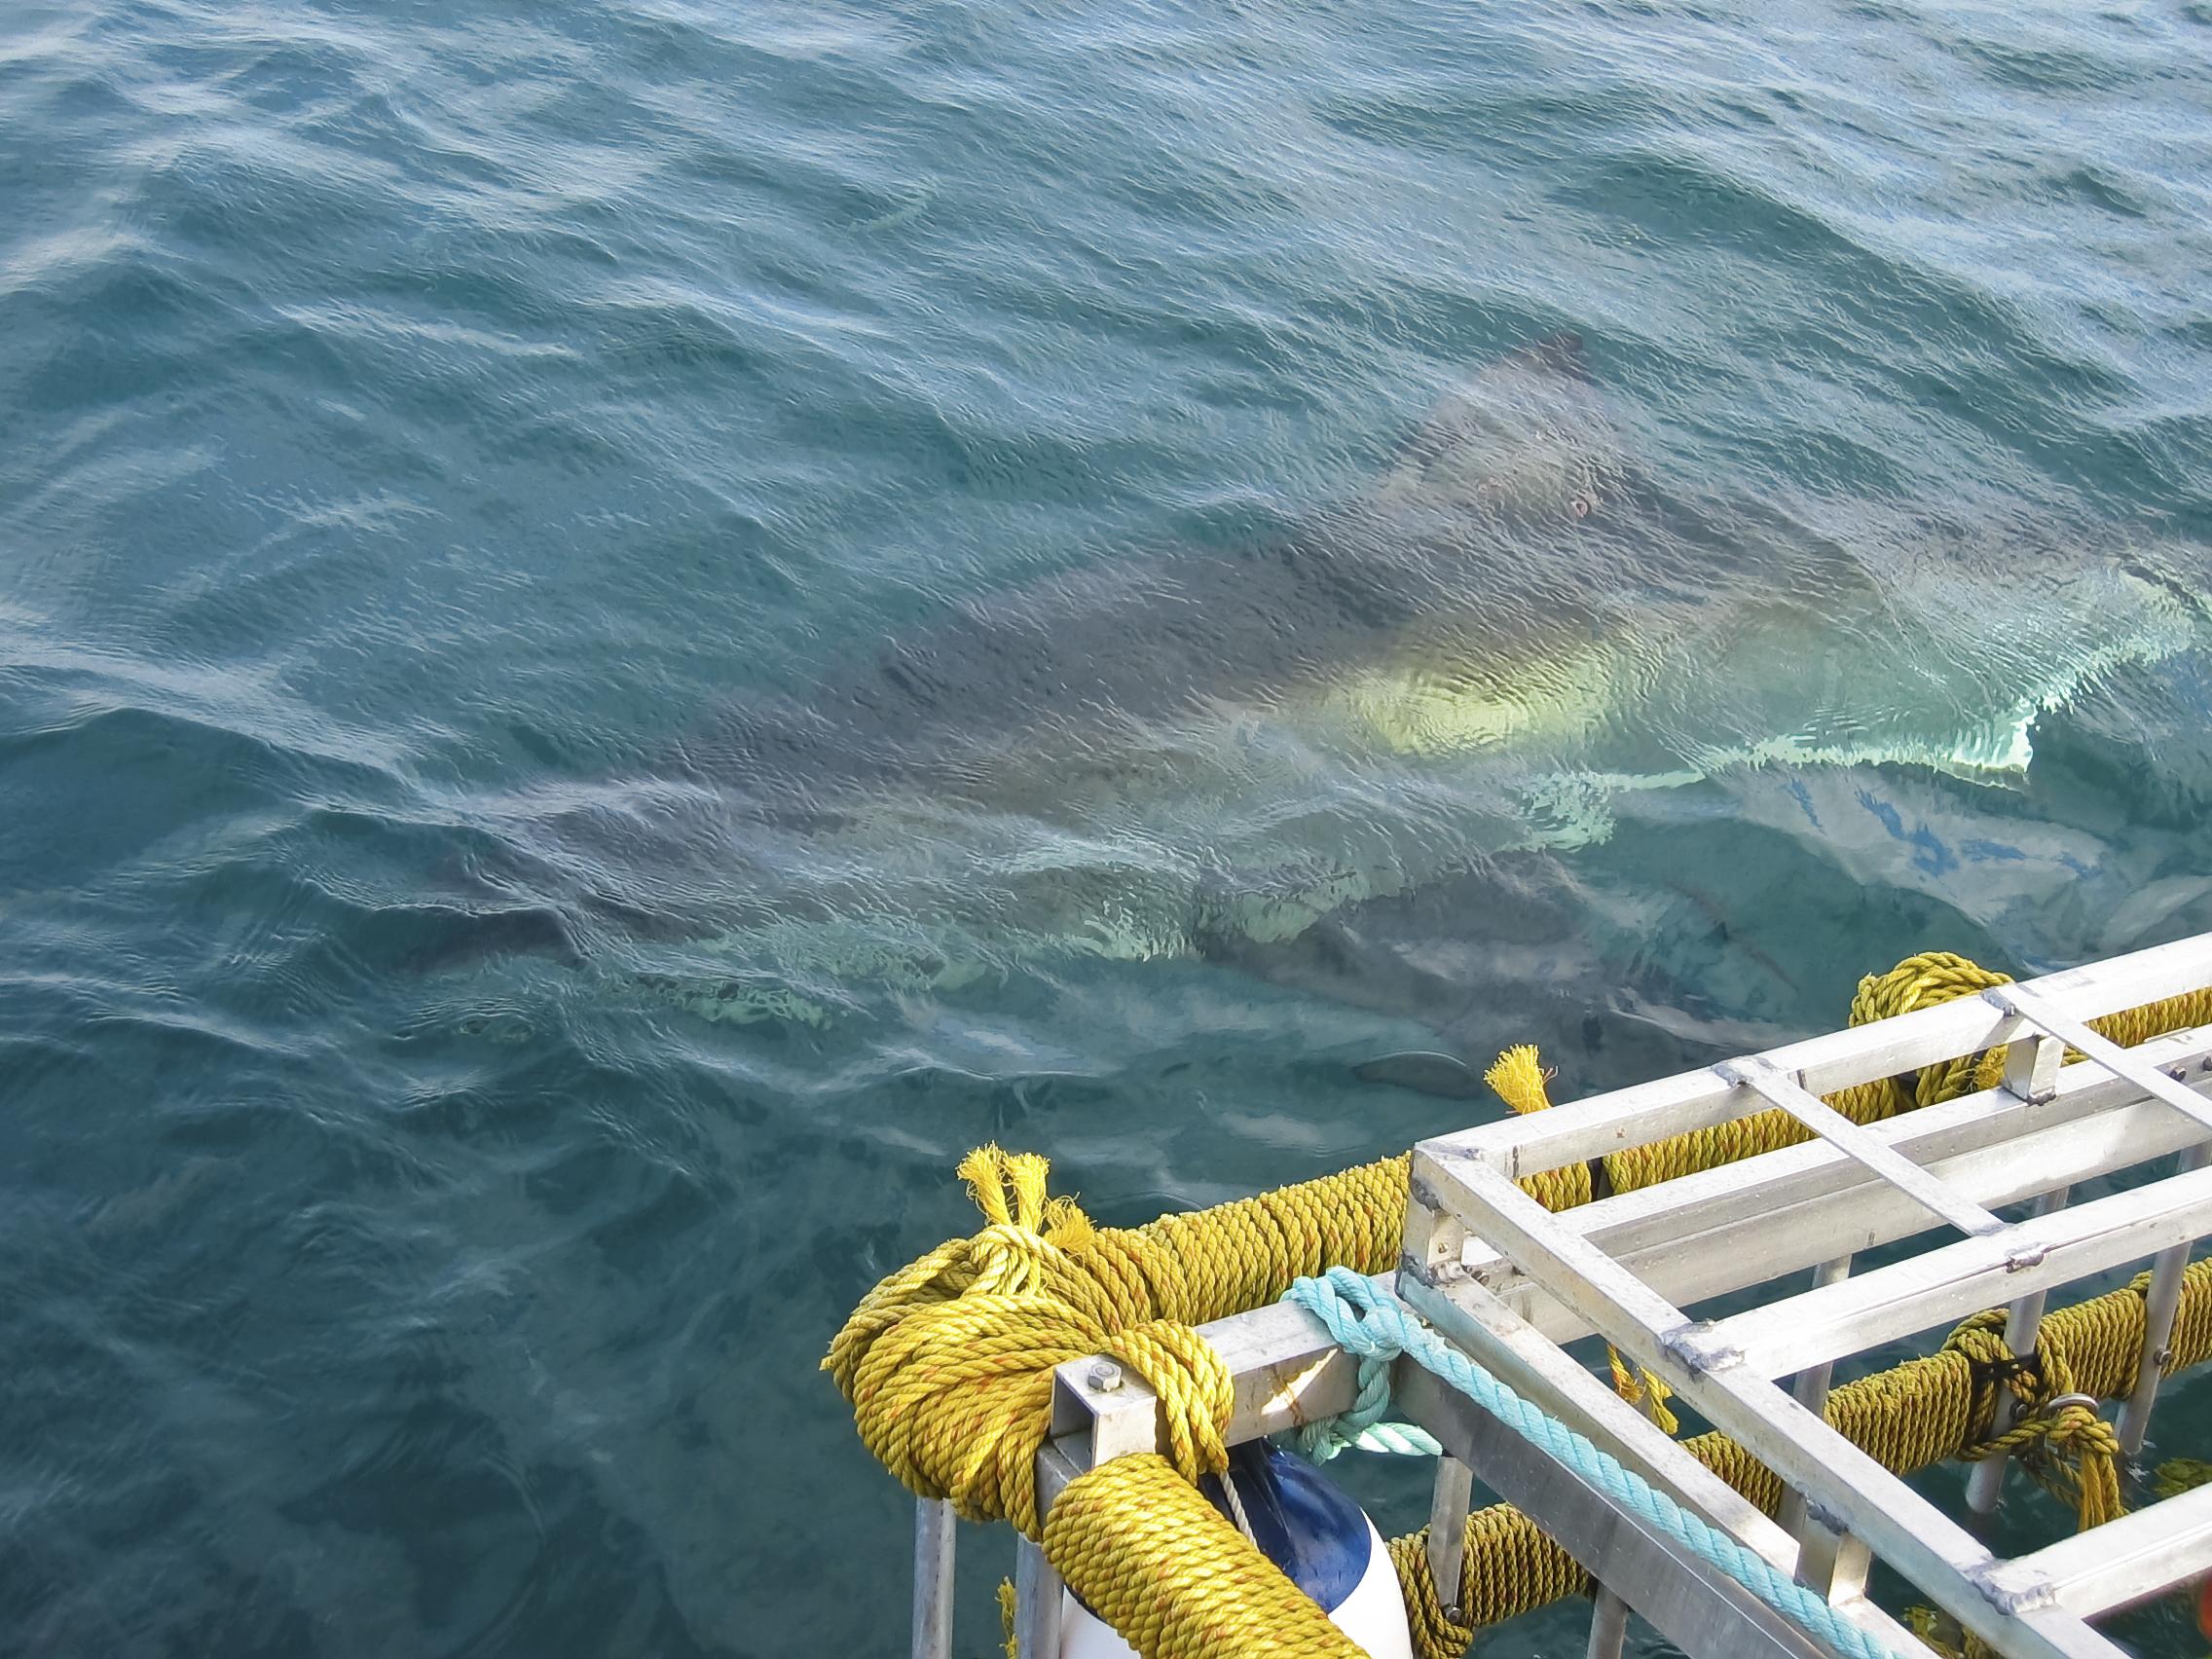 Shark Cage Diving, Cape Town - iStock_000008183551Medium